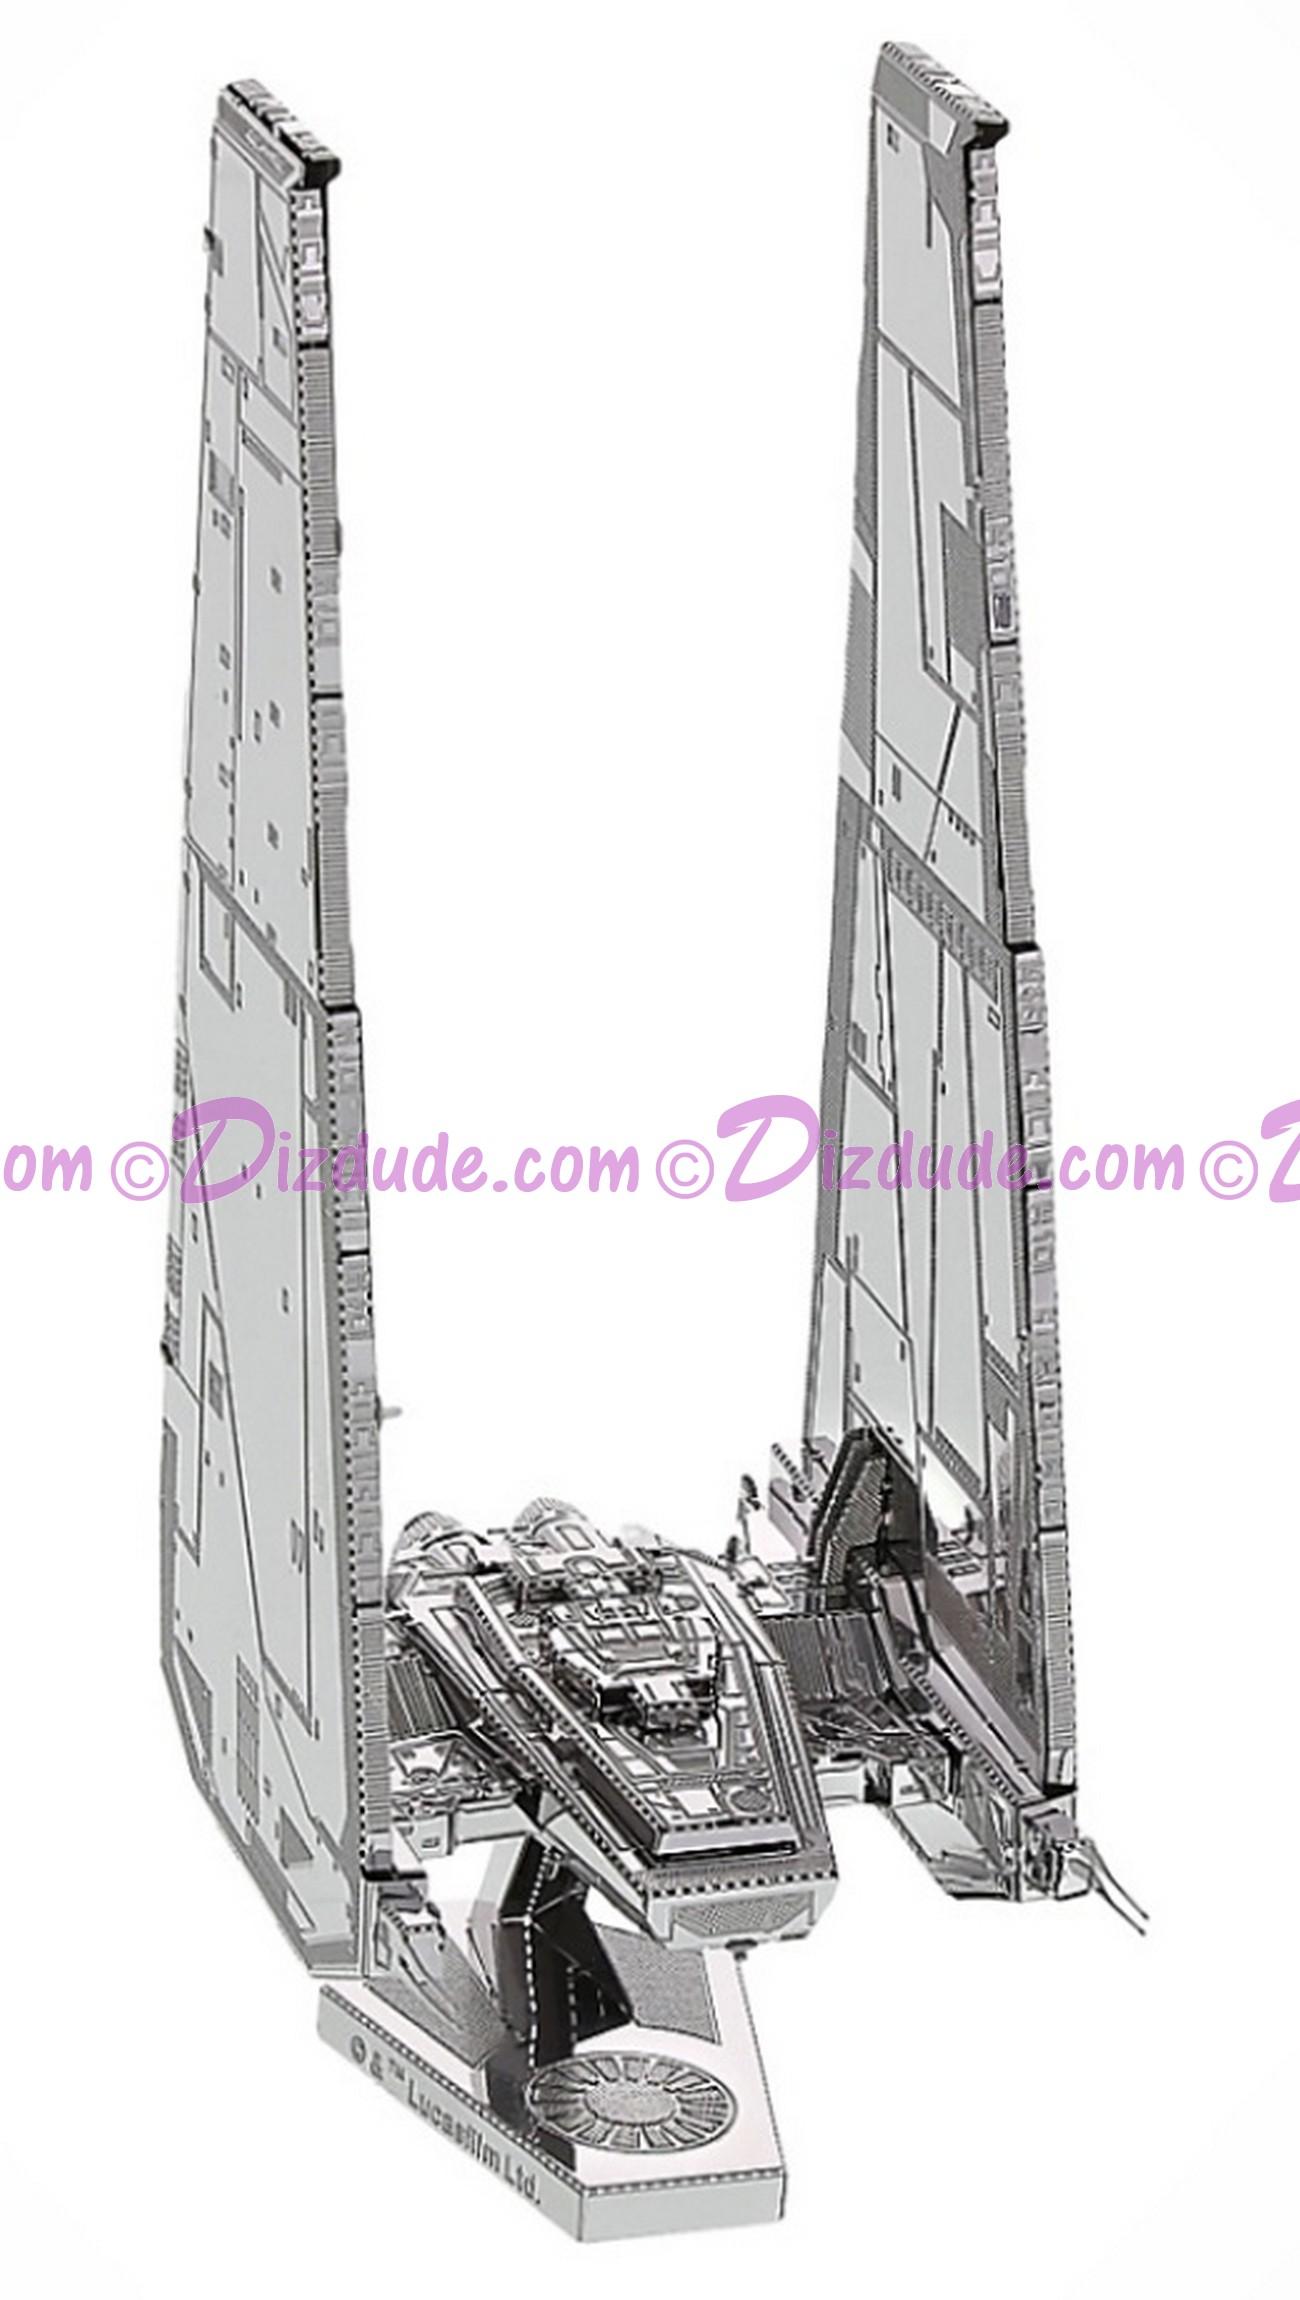 The Force Awakens Kylo Ren's Command Shuttle 3D Metal Model Kit ~ Disney Star Wars © Dizdude.com